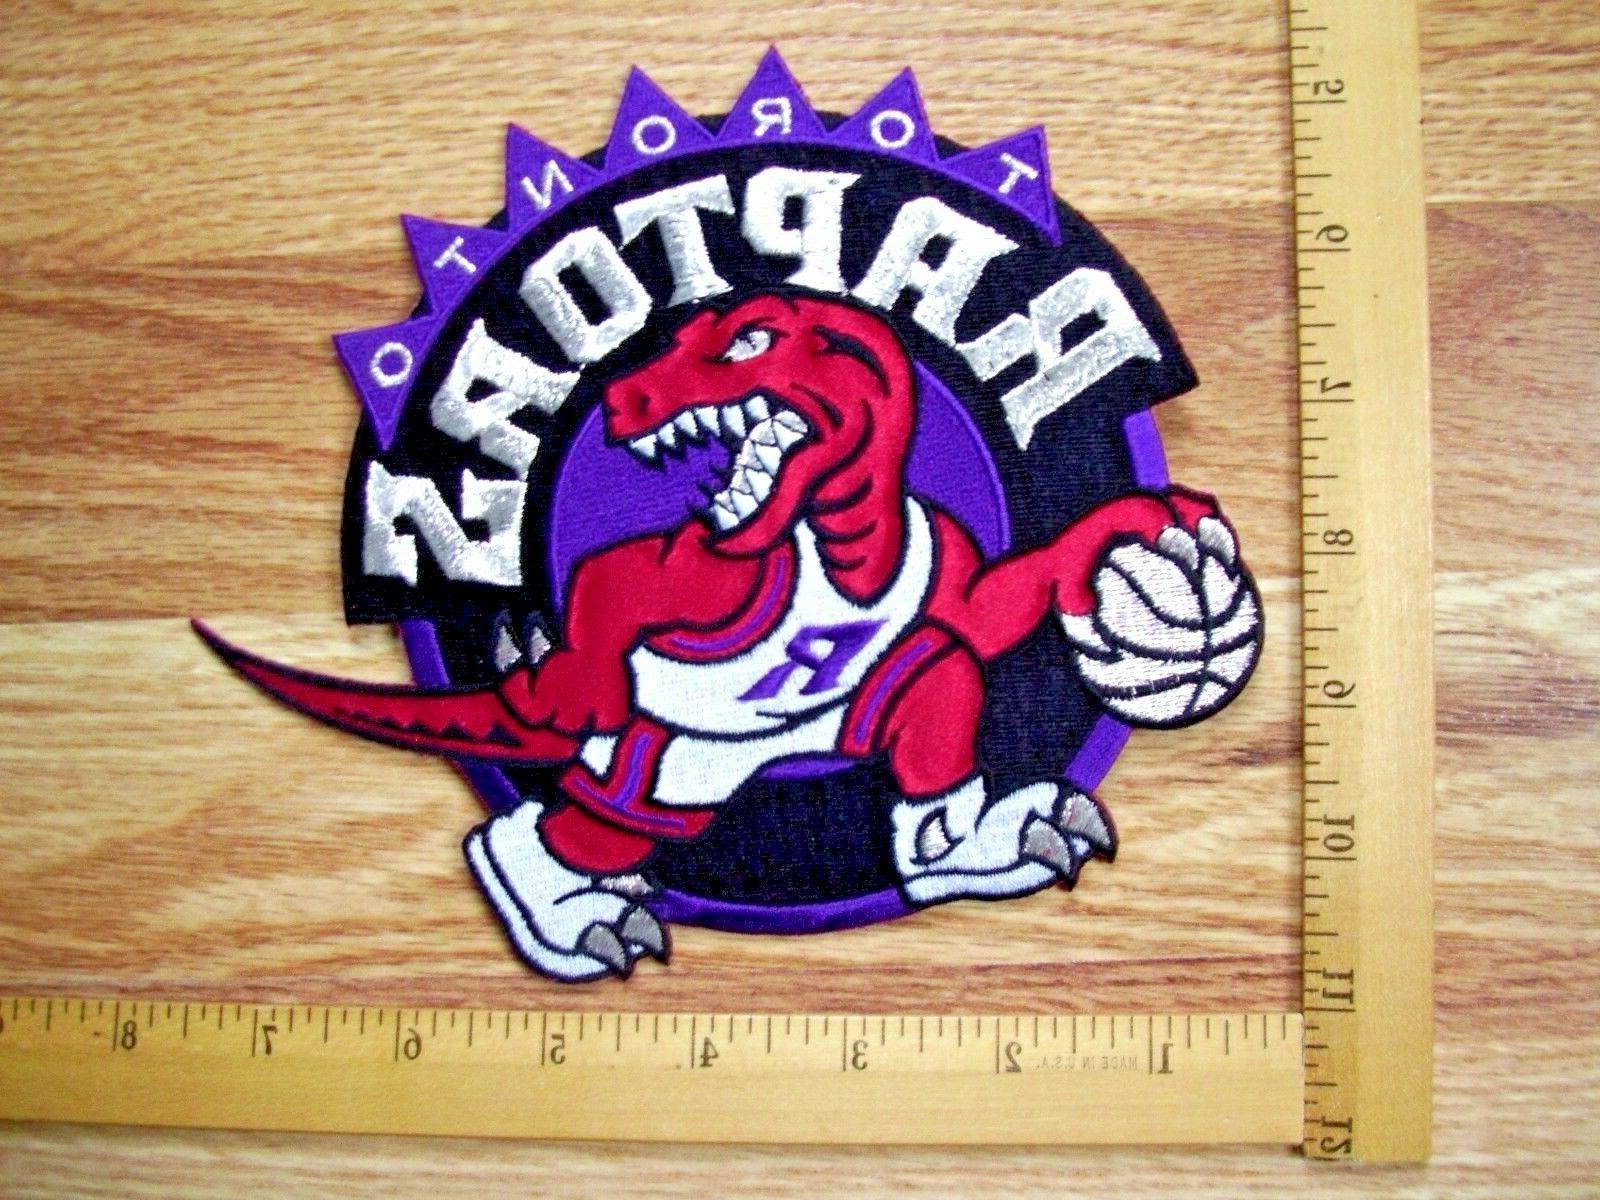 one big beautiful toronto raptors nba basketball